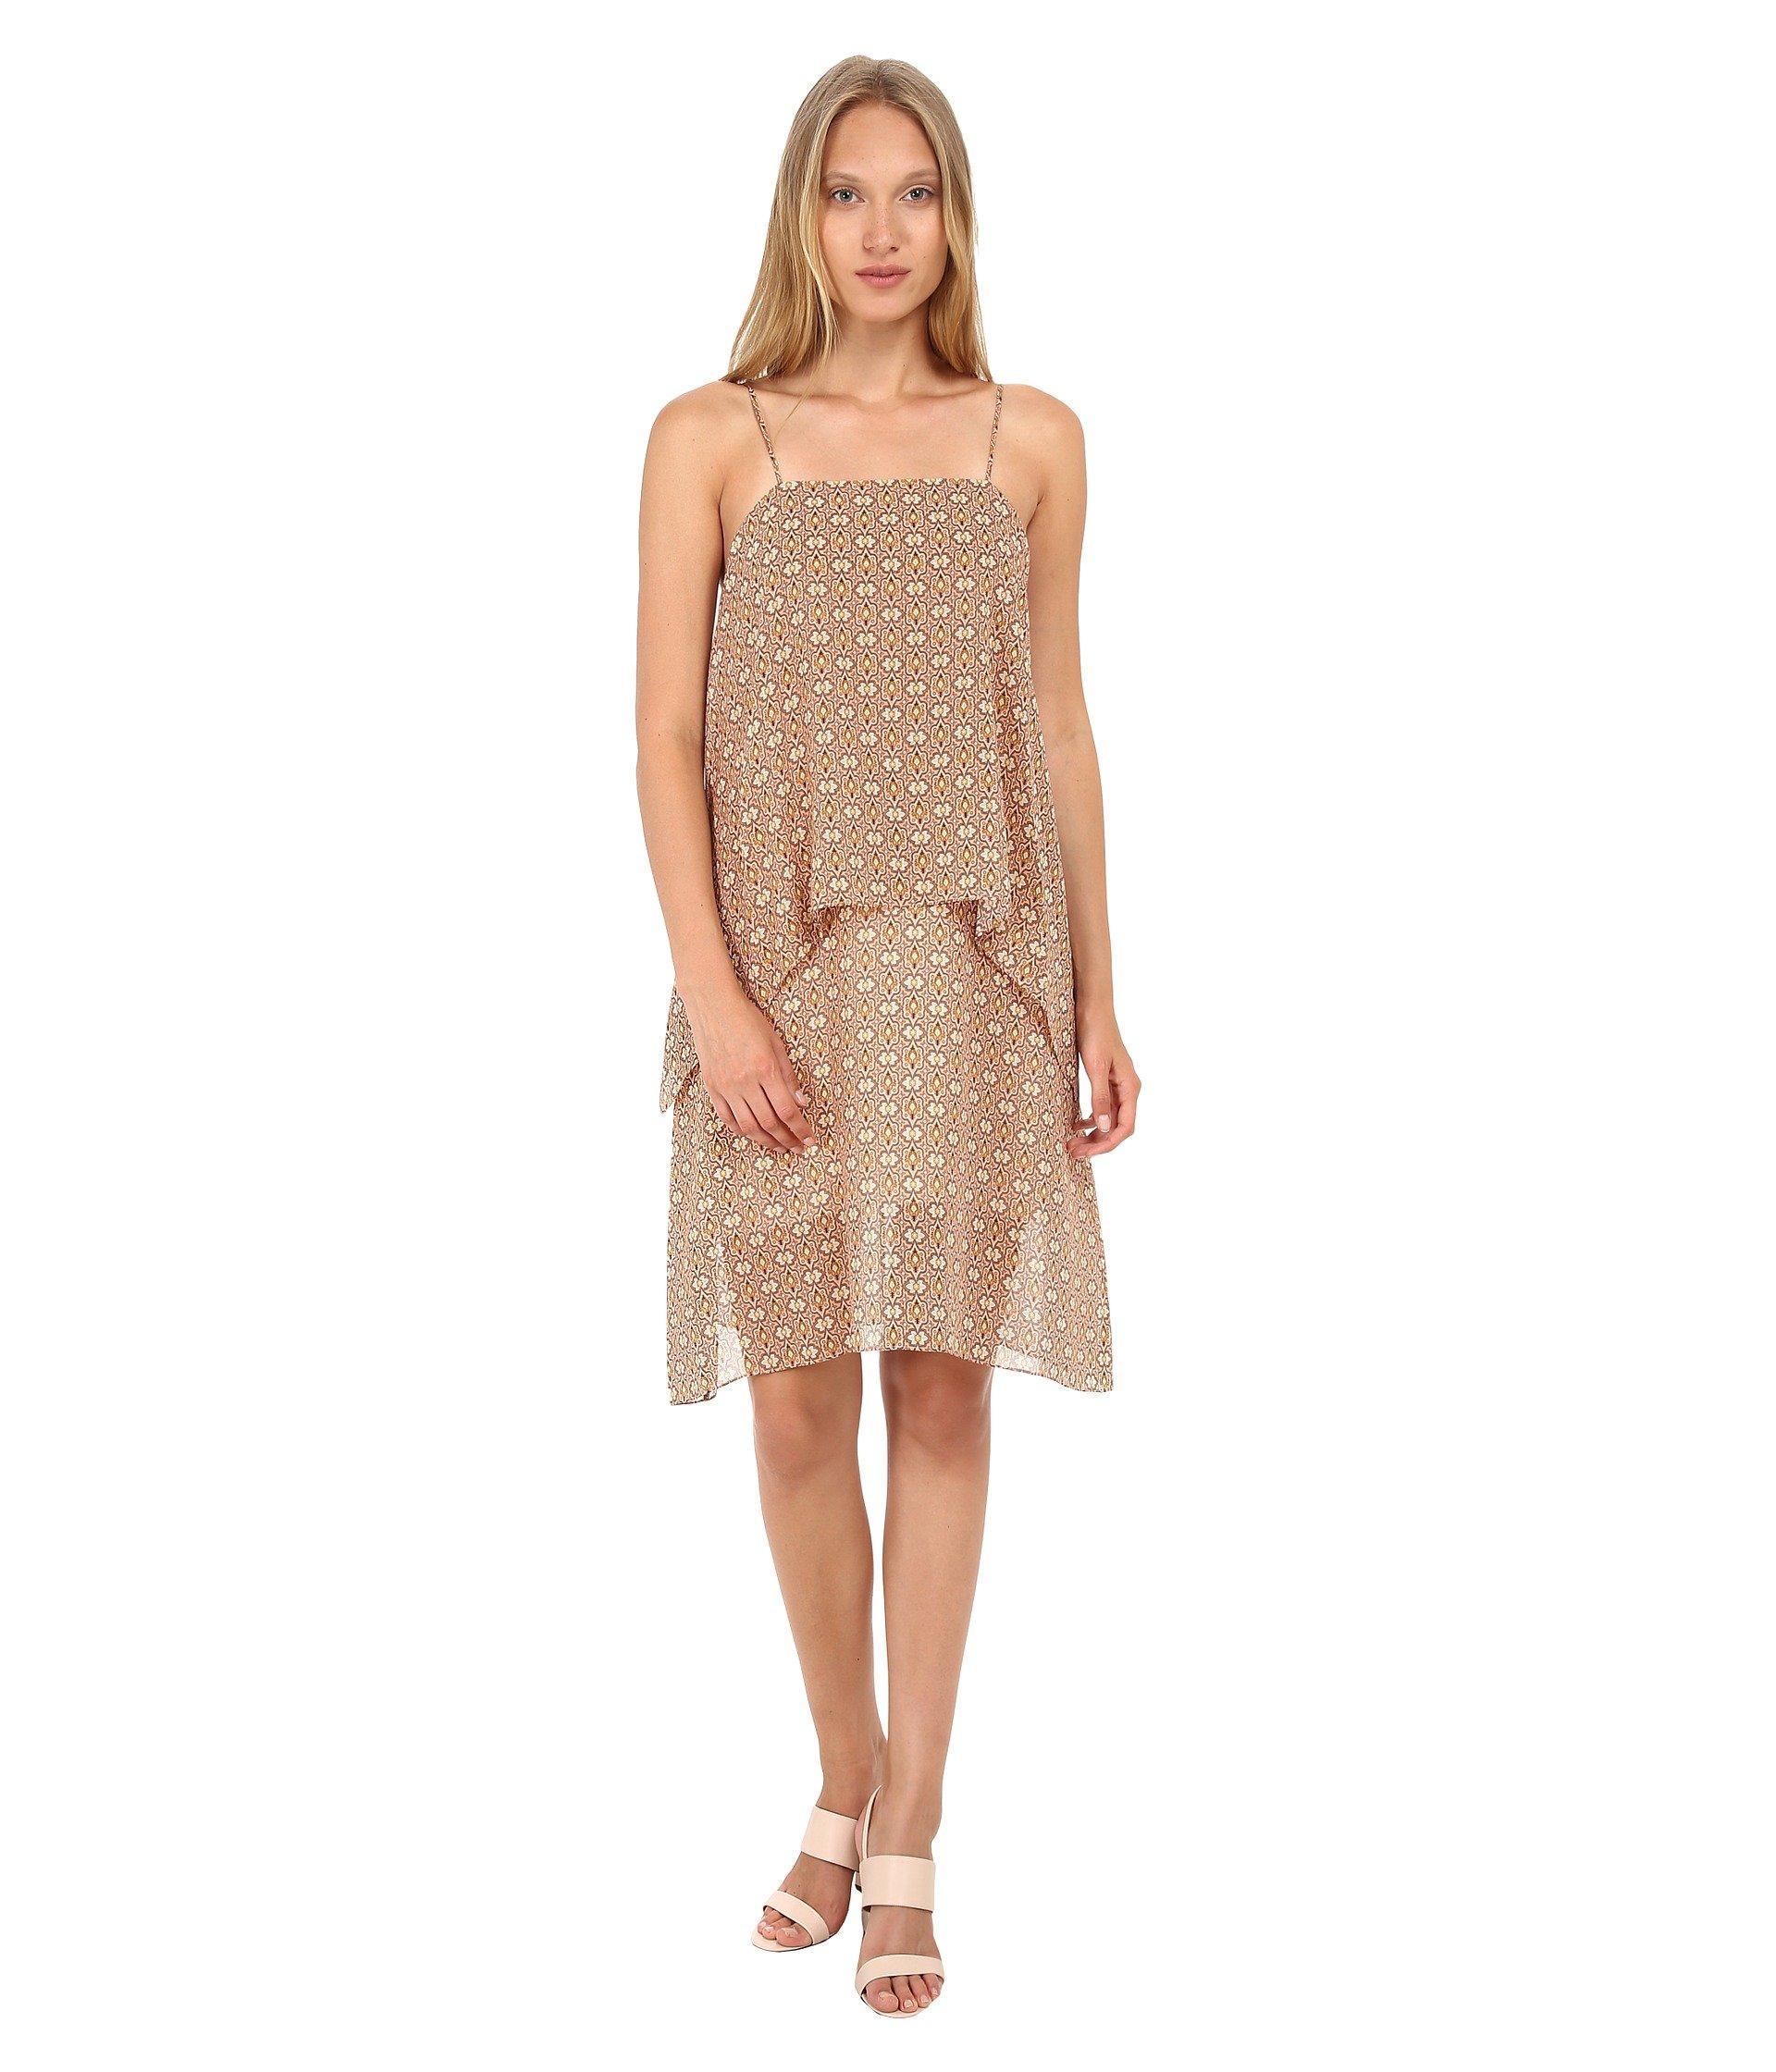 Theory Women's Dafeon Dress Nectar Dress